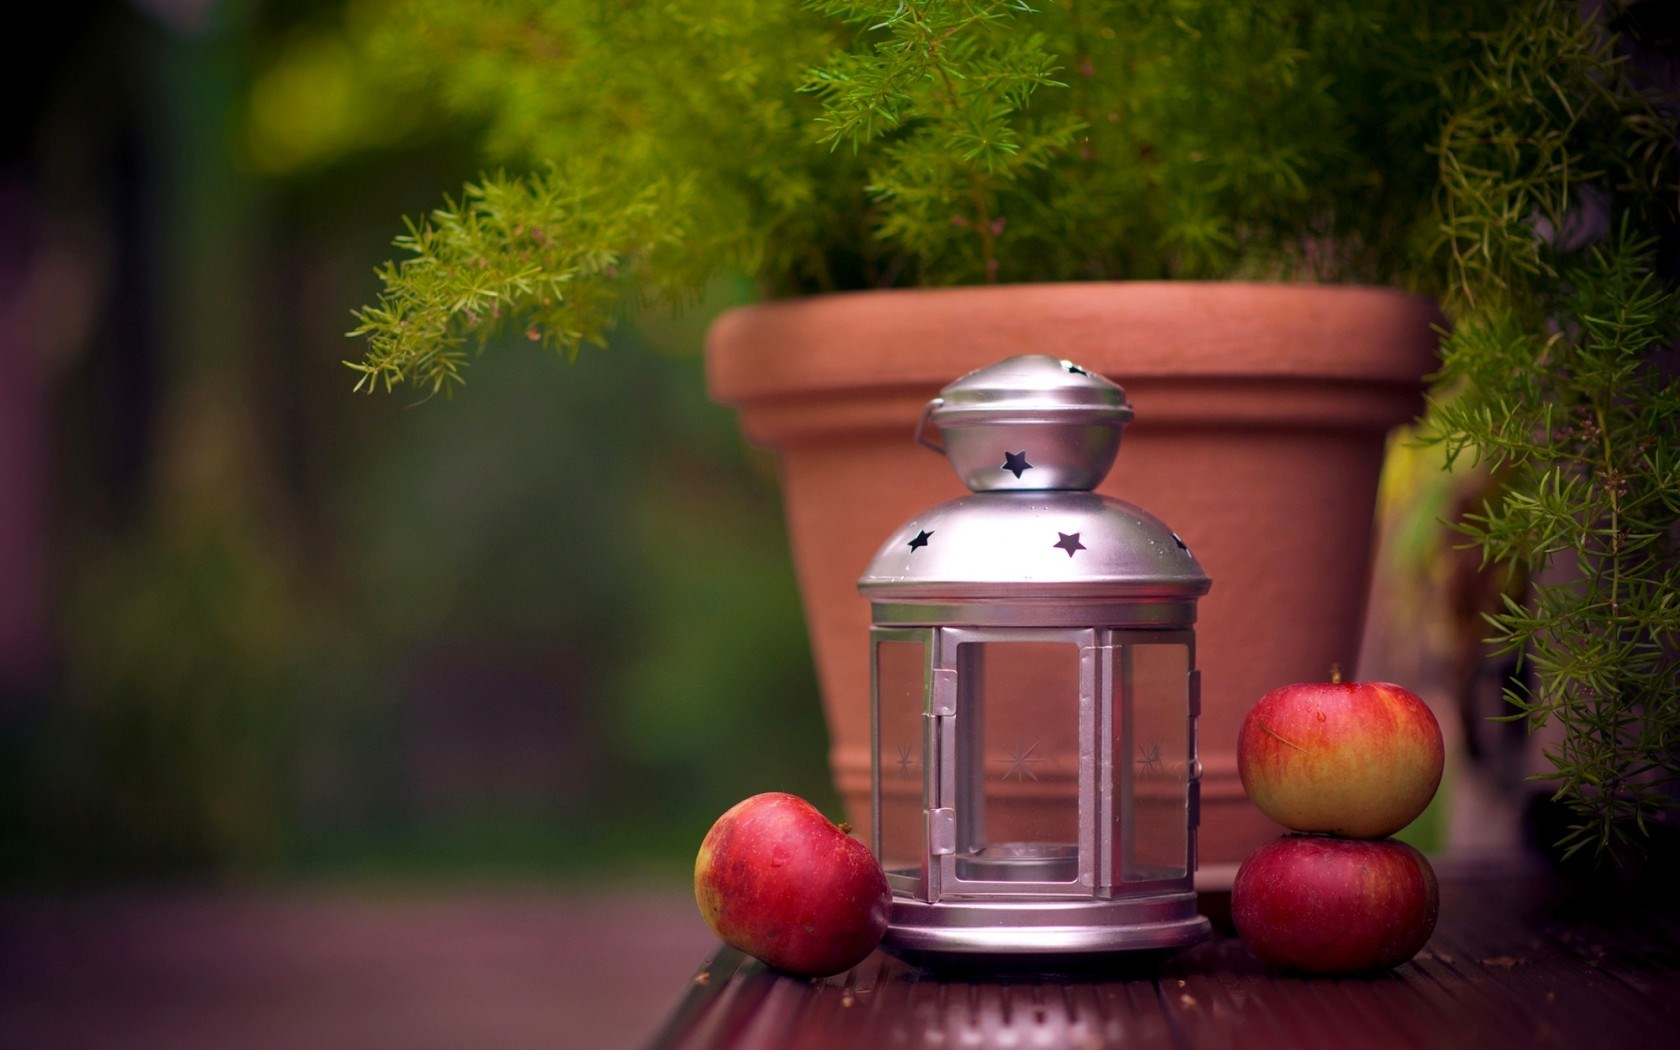 Lantern Ikea Vase Plant Apples